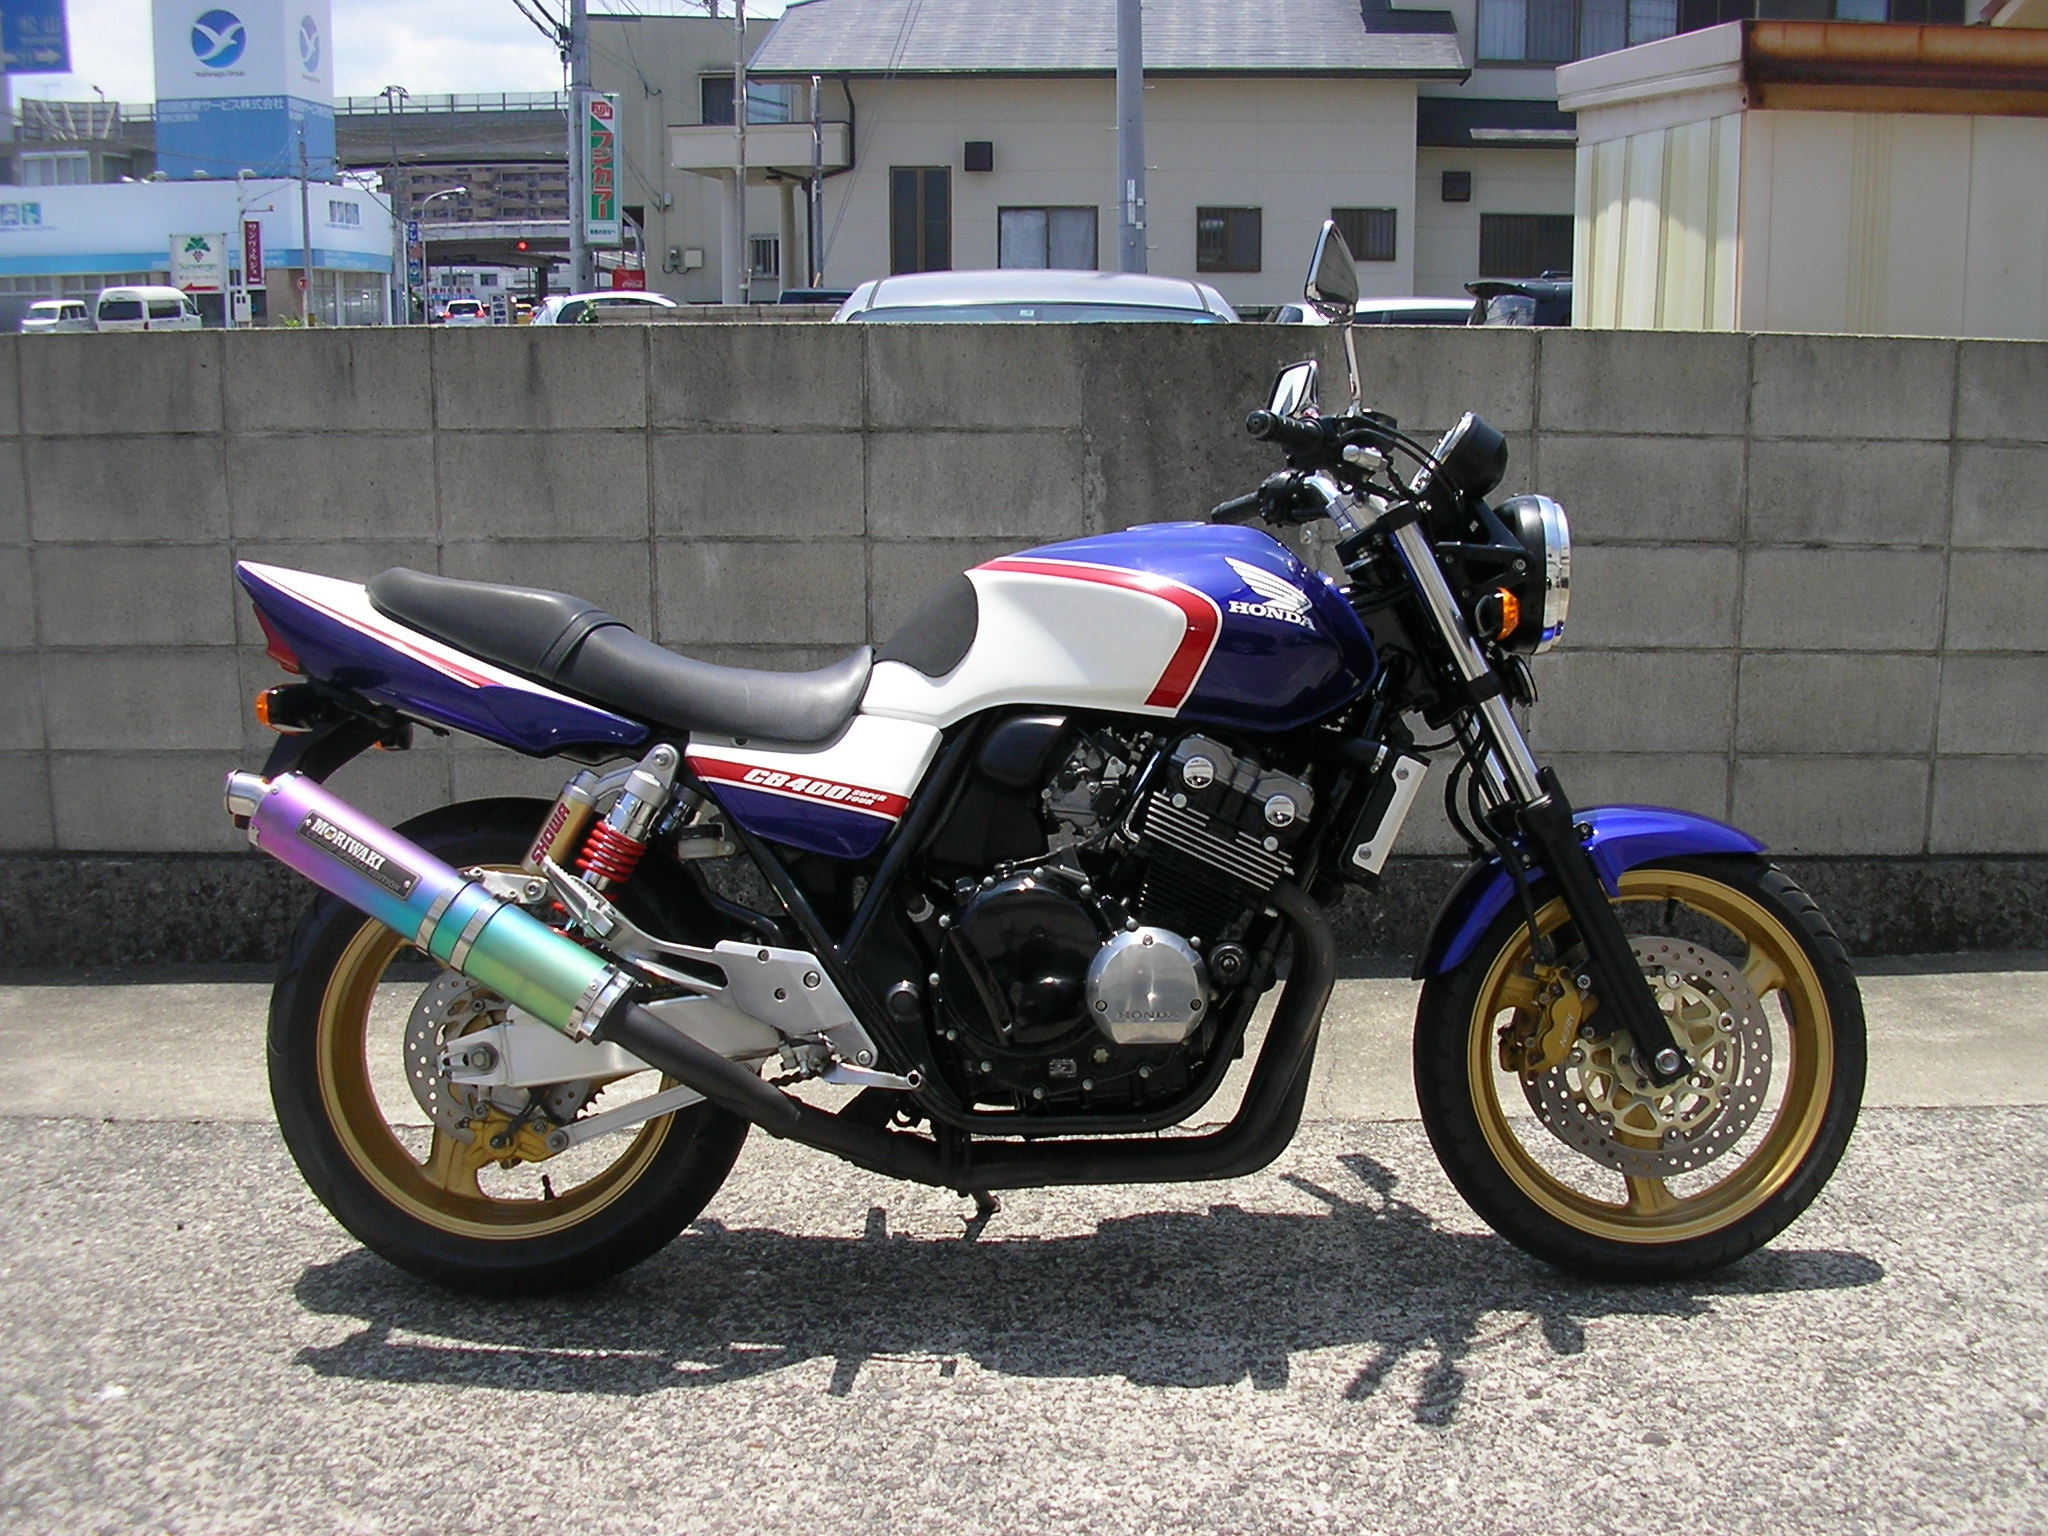 CB400SF VTEC2 (FC-000) - 【公式】レンタルバイクのベストBike® 蒜山高原